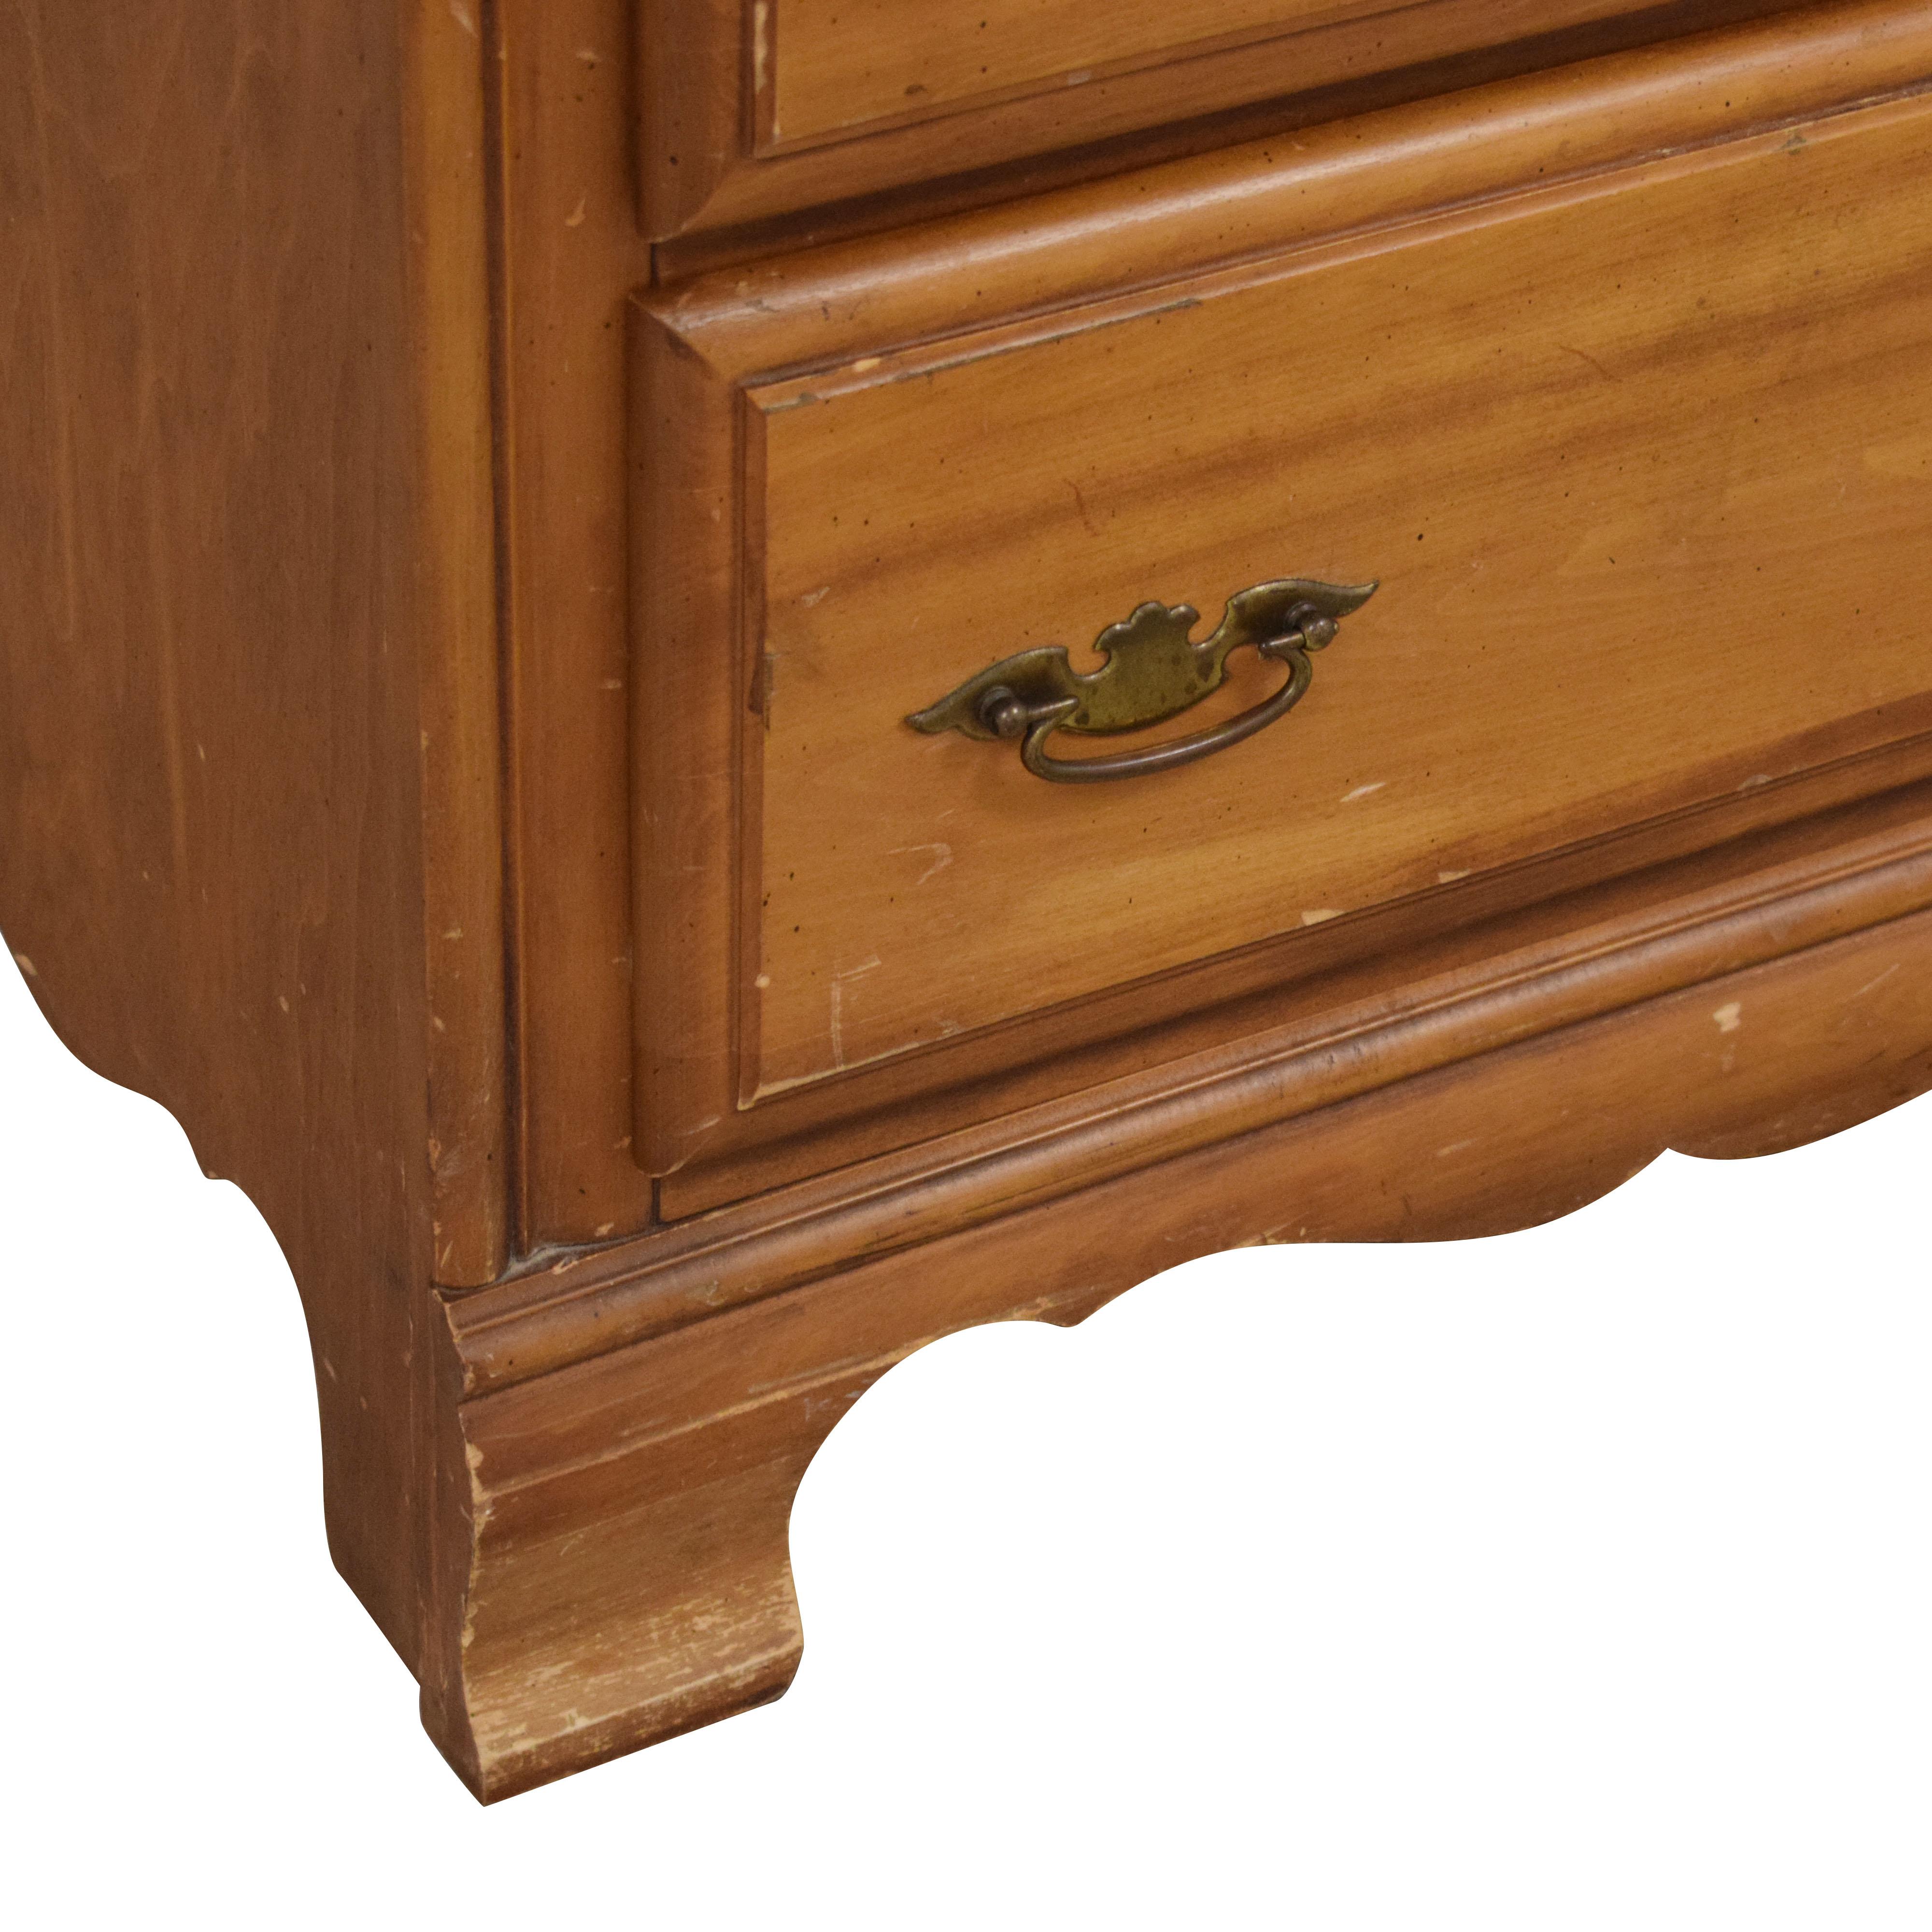 Sumter Cabinet Co. Sumter Cabinet Co. Dresser coupon